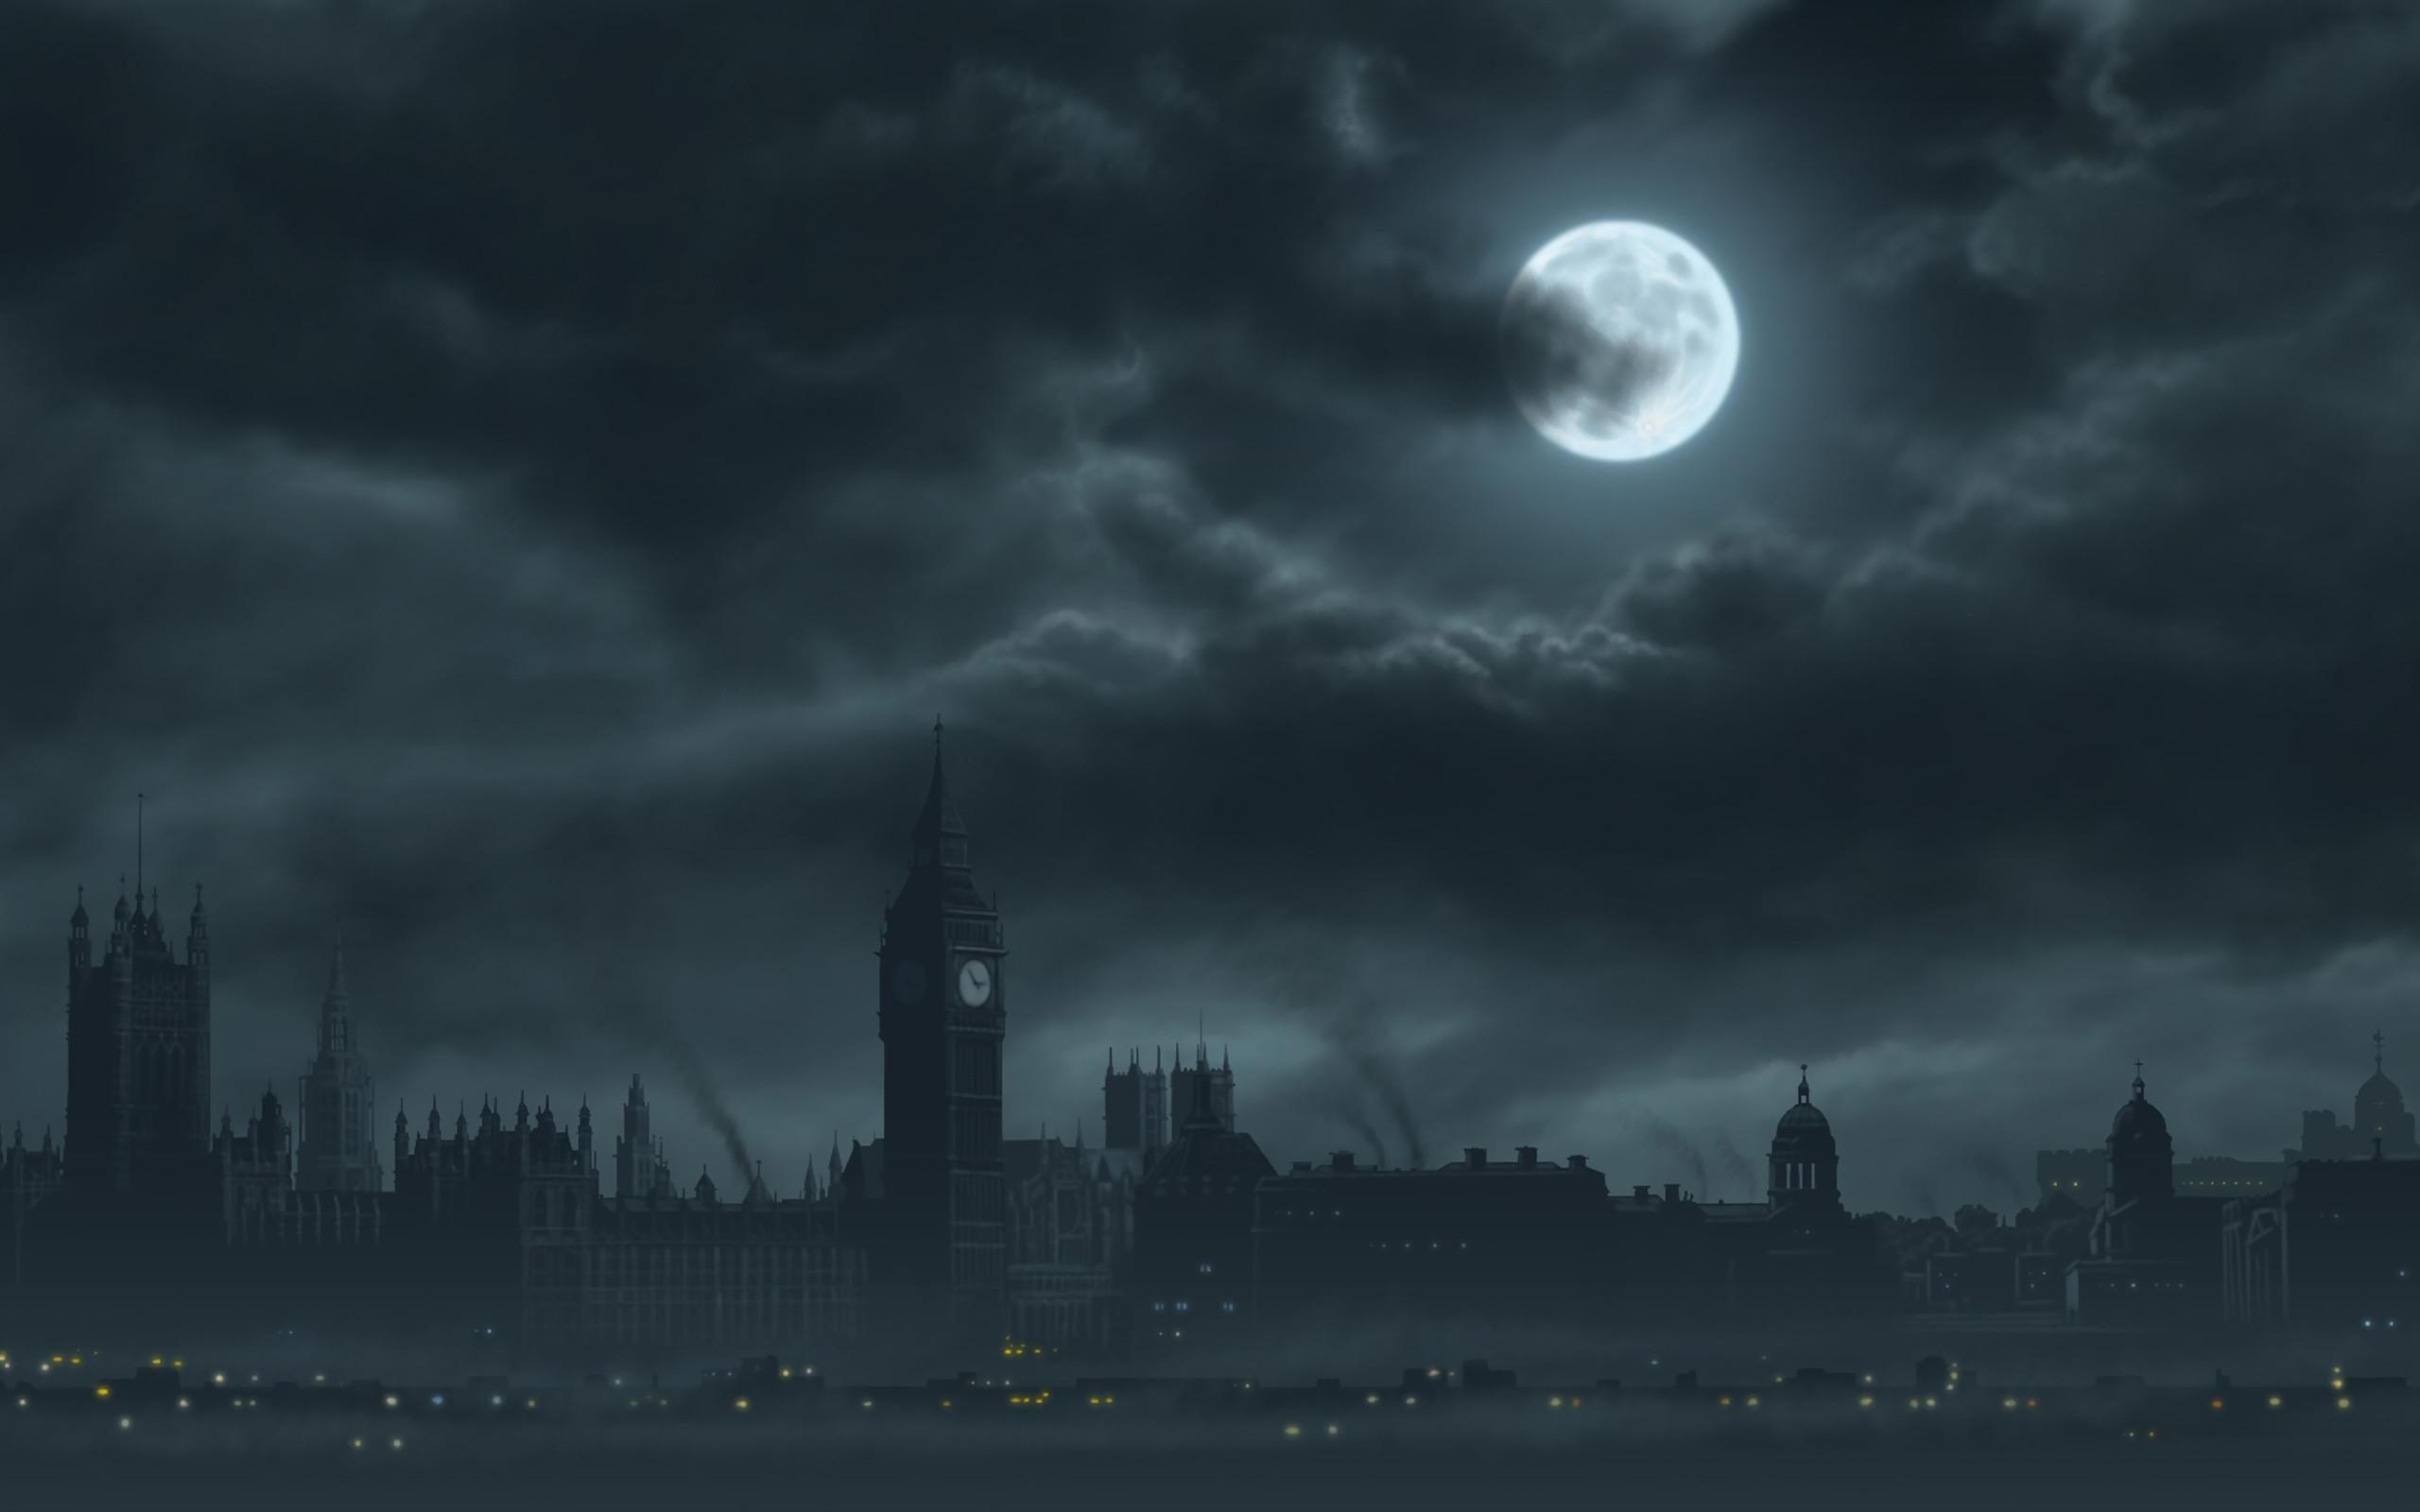 Dark City Background 59 Pictures